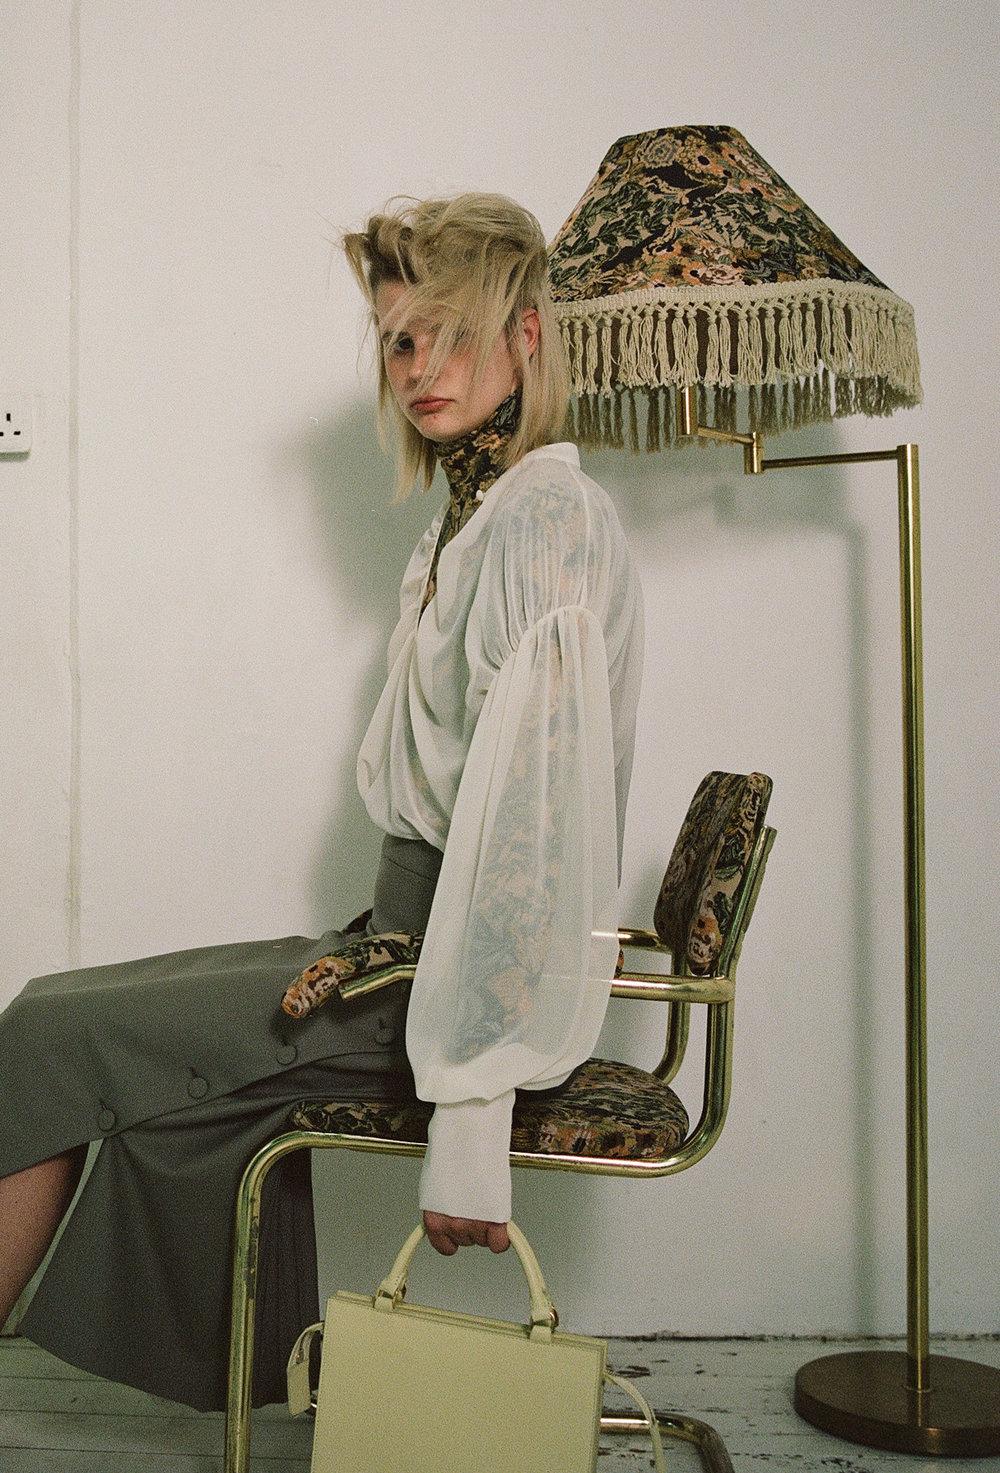 rokh_ss19_collection_fashion_vogue_lookbook_006.jpg